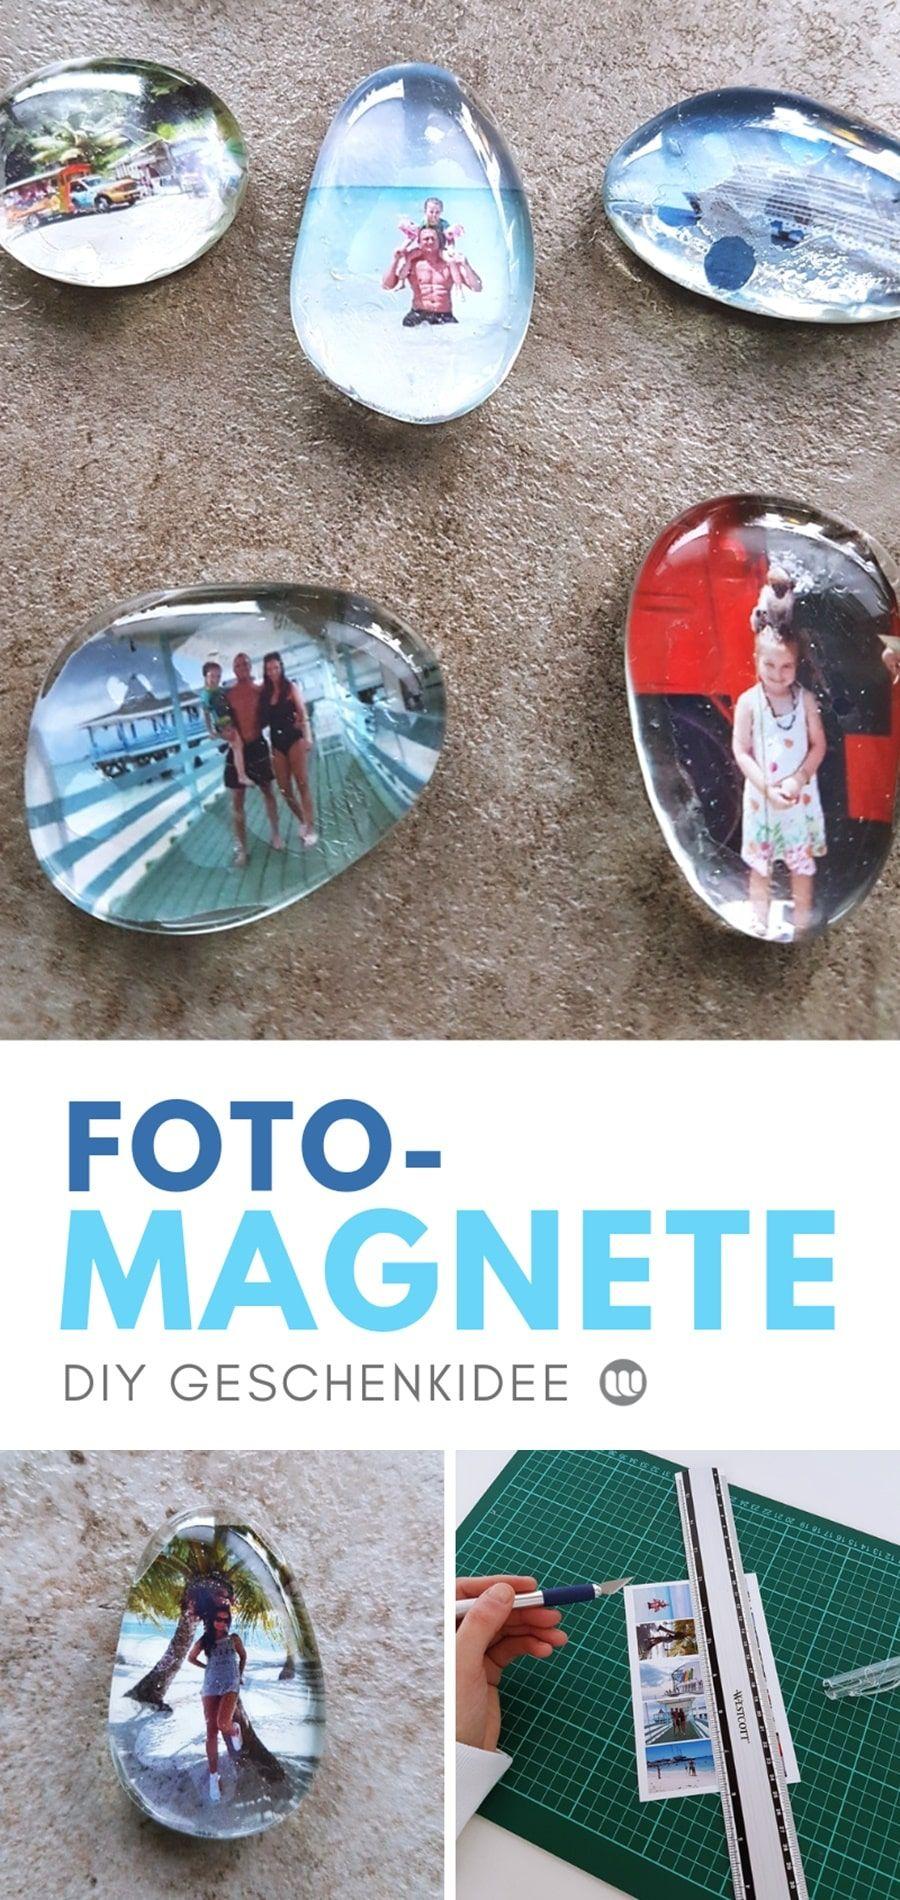 Fotomagnete selbst gestalten: Schnelles DIY Fotogeschenk